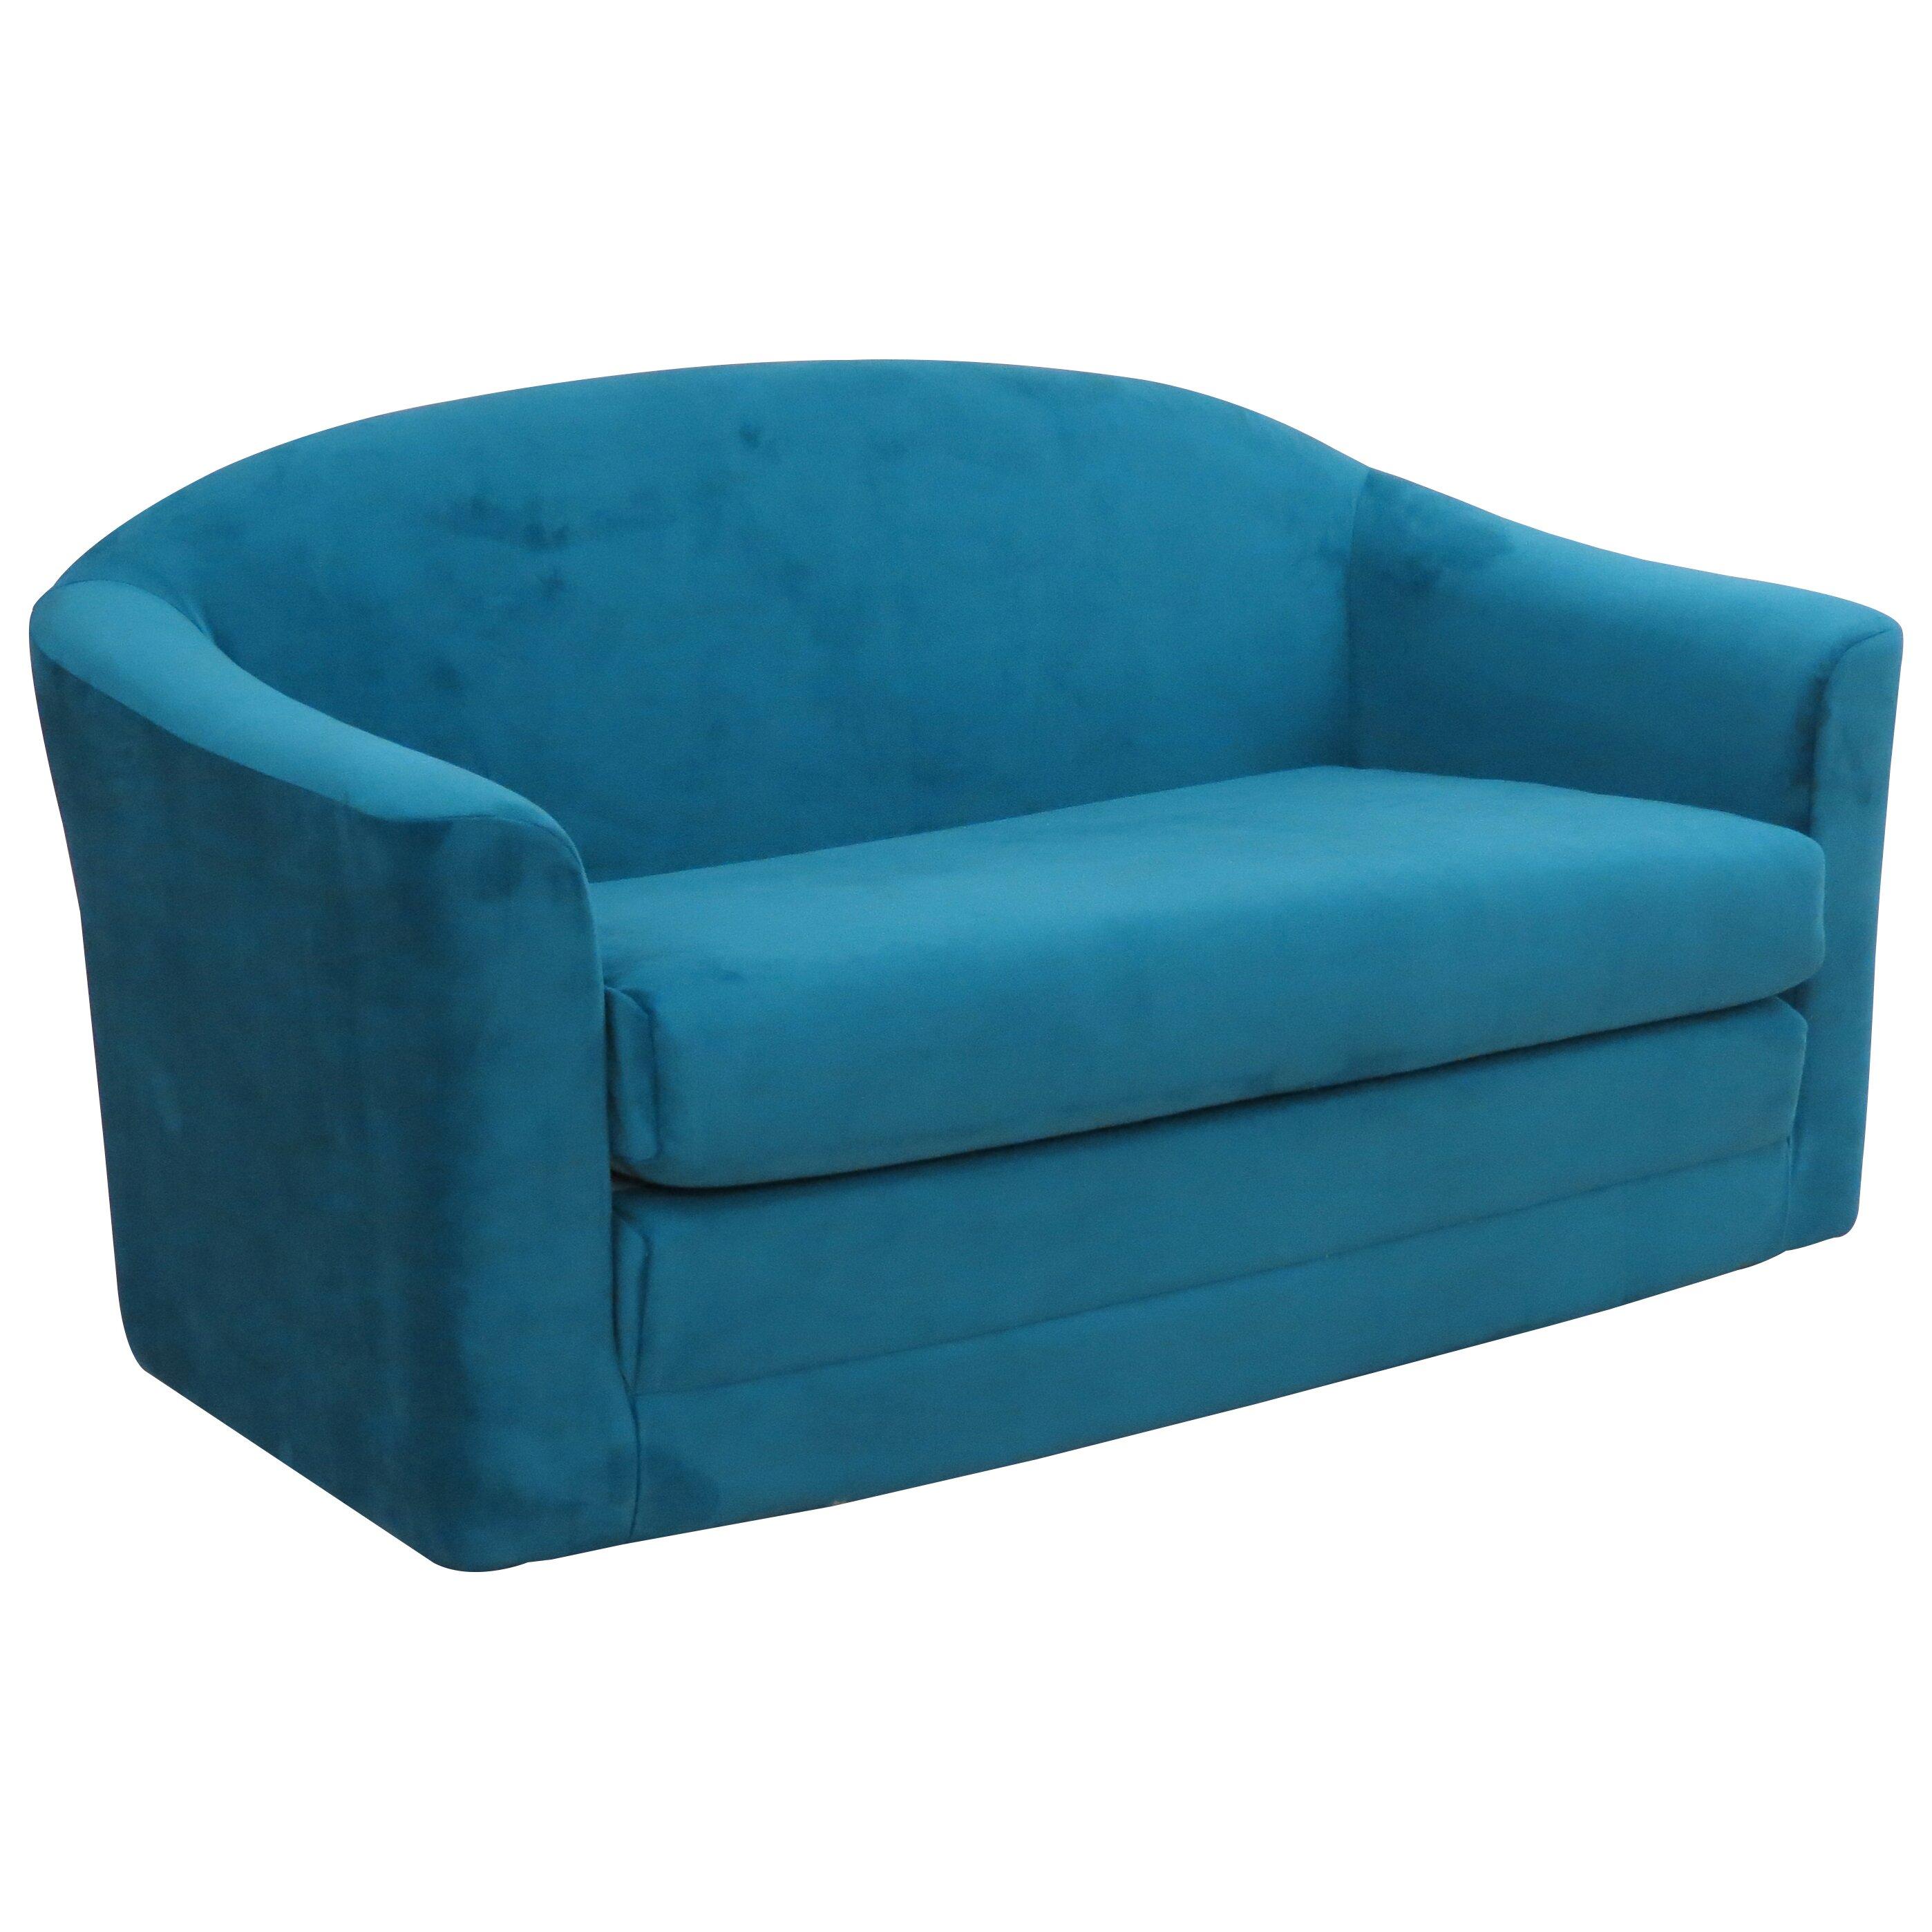 Kids Sleeper Sofa USL TV BA FOXH